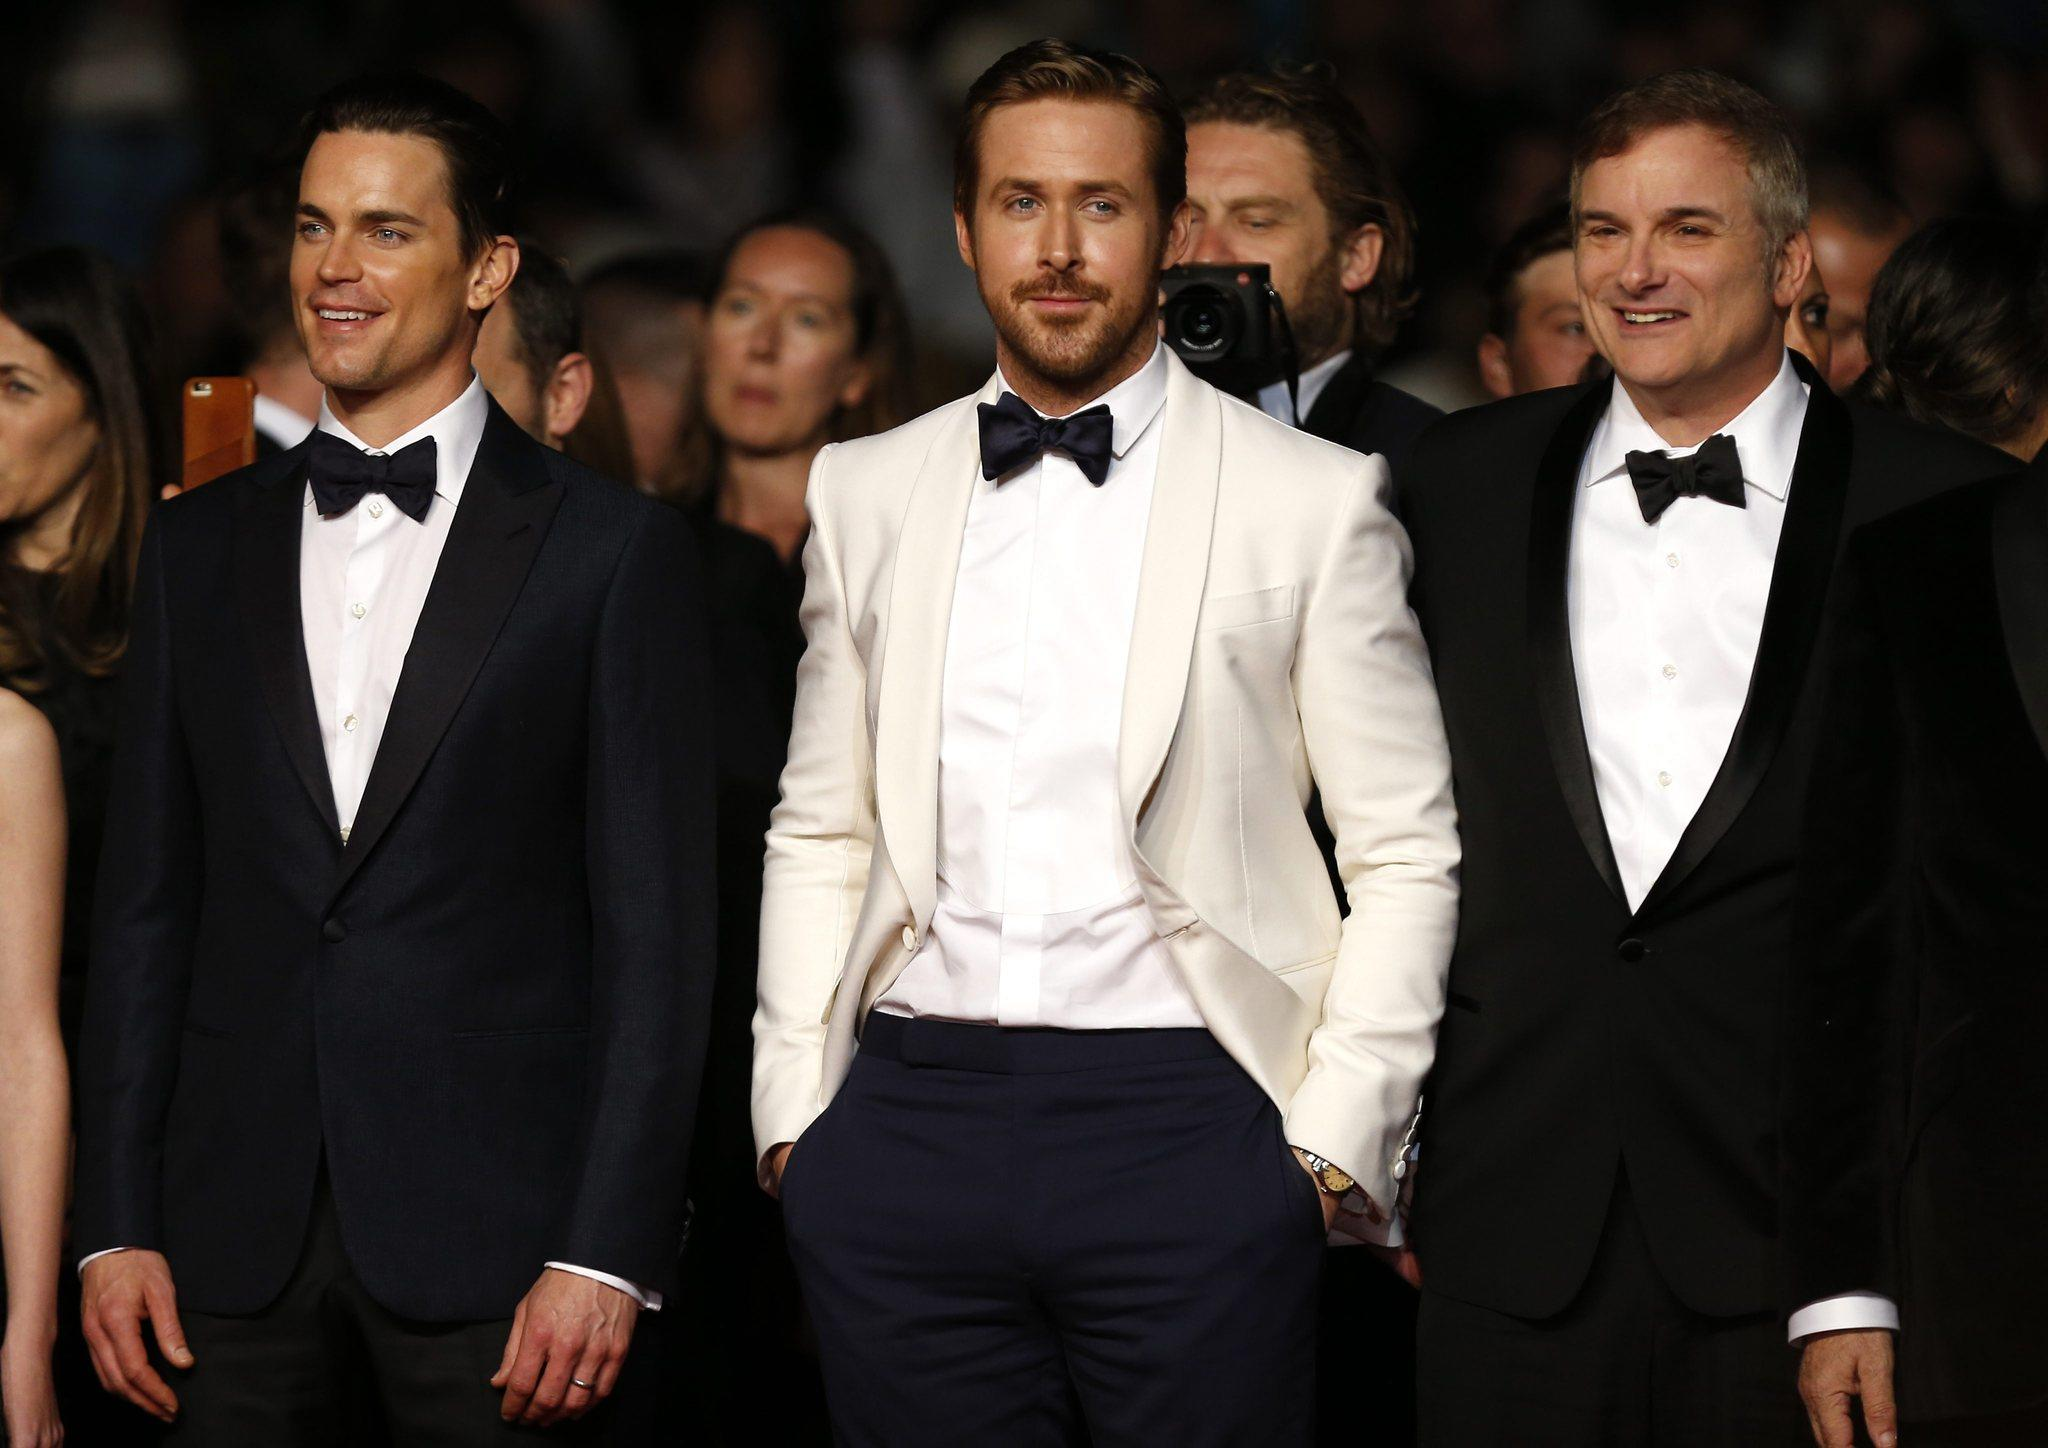 Cannes 2016: Ken Loach's 'I, Daniel Blake' wins Palme d'Or ...